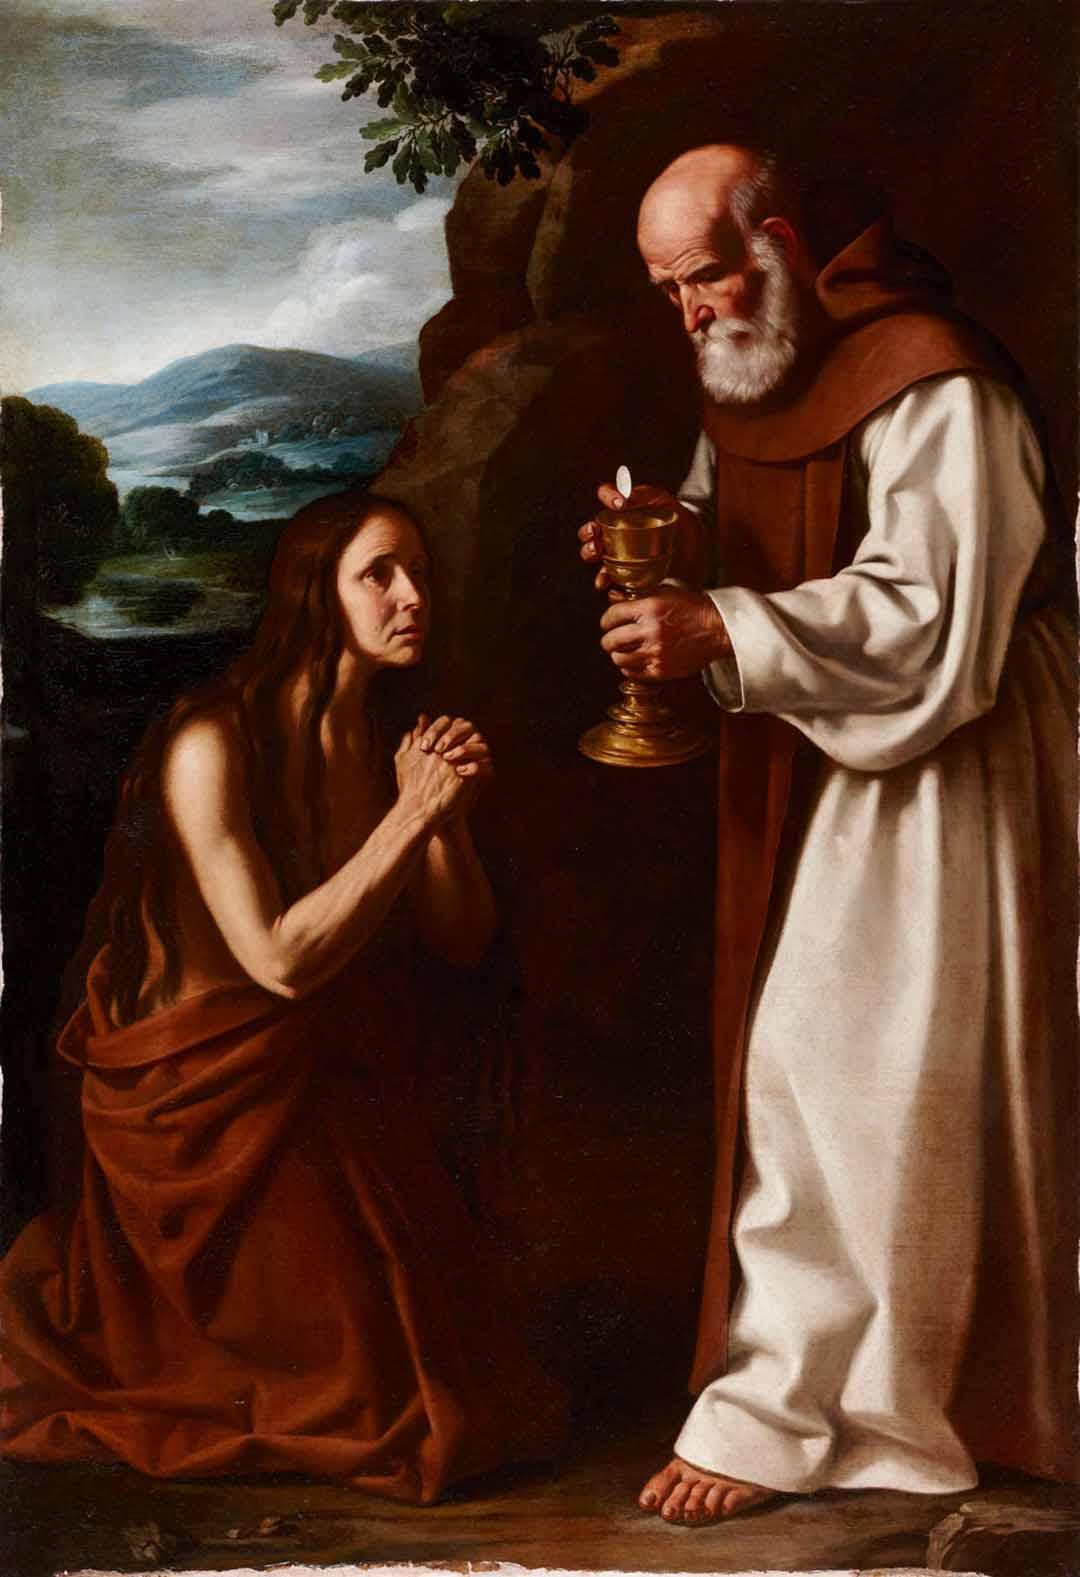 Catalogo La ultima comunion de santa Maria Egipciaca Pedro de Orrente Galeria Caylus